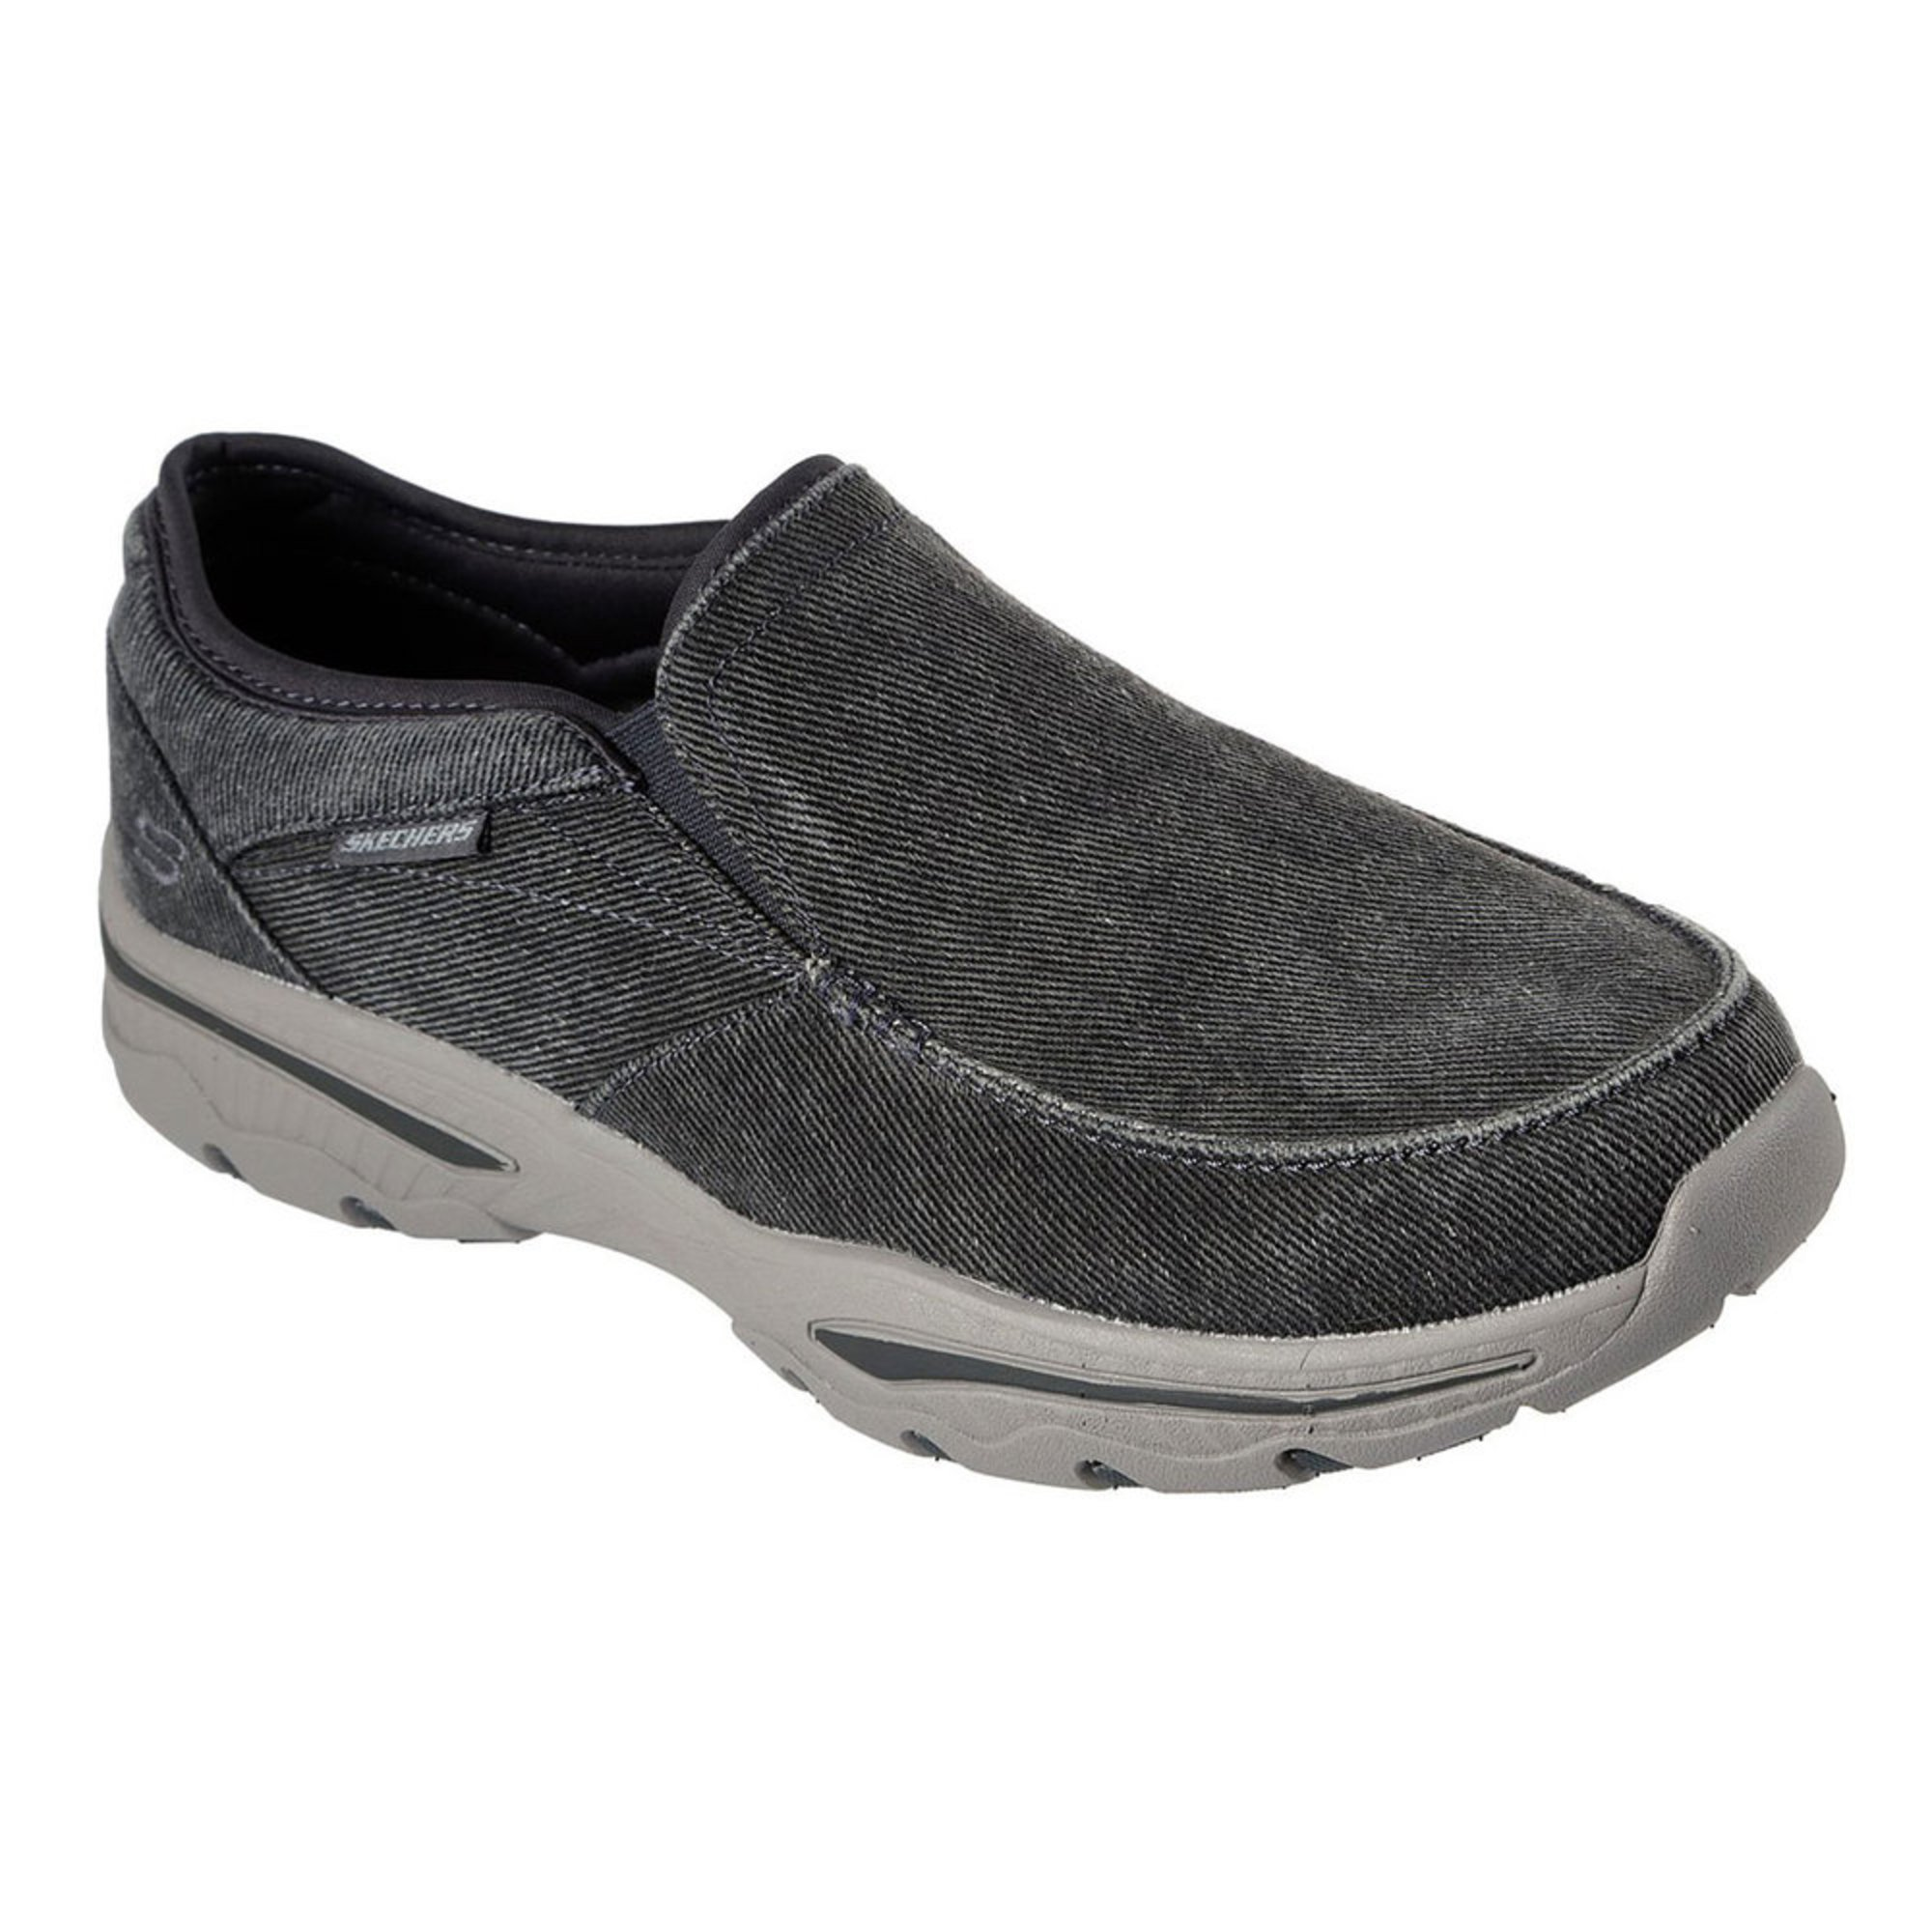 Skechers Men's Creston Moseco Slip-on